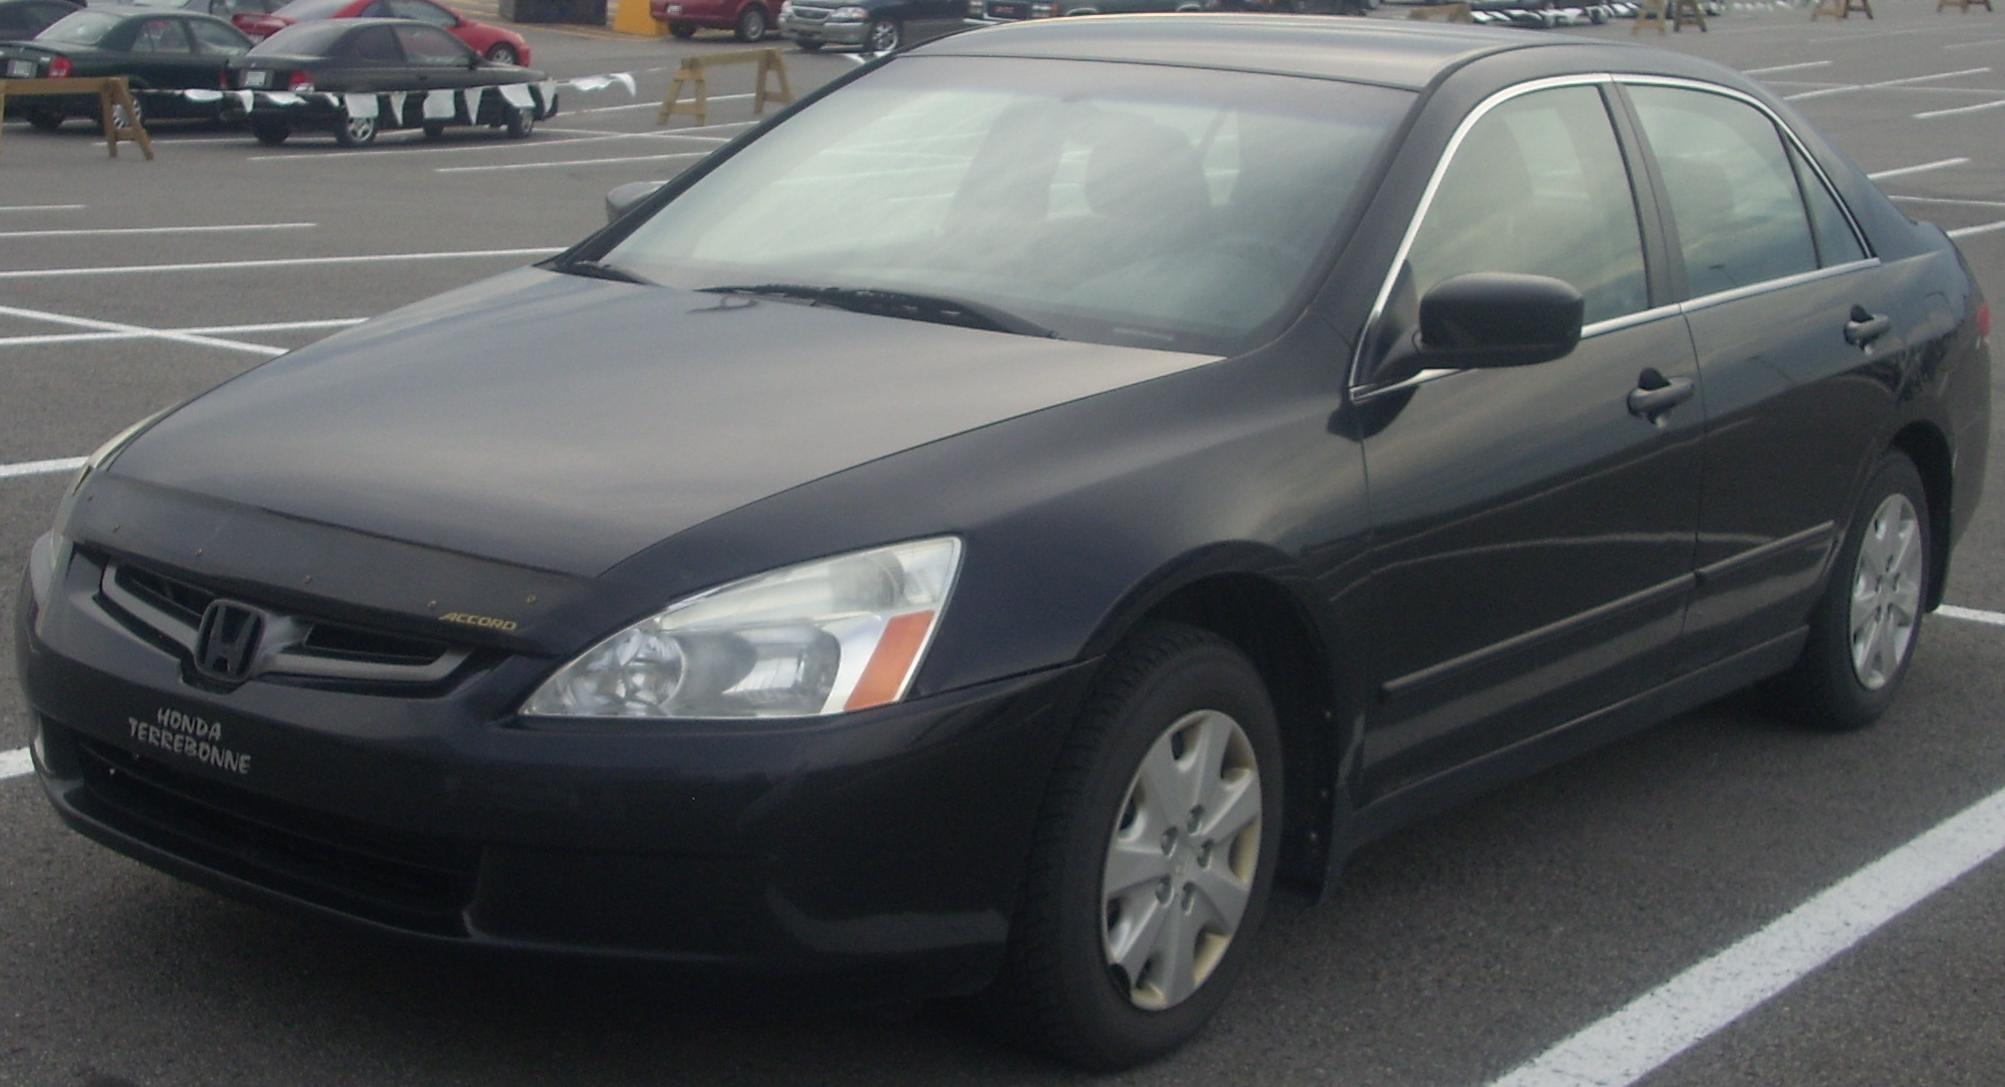 File:'03-'04 Honda Accord Sedan (Les chauds vendredis '10 ...